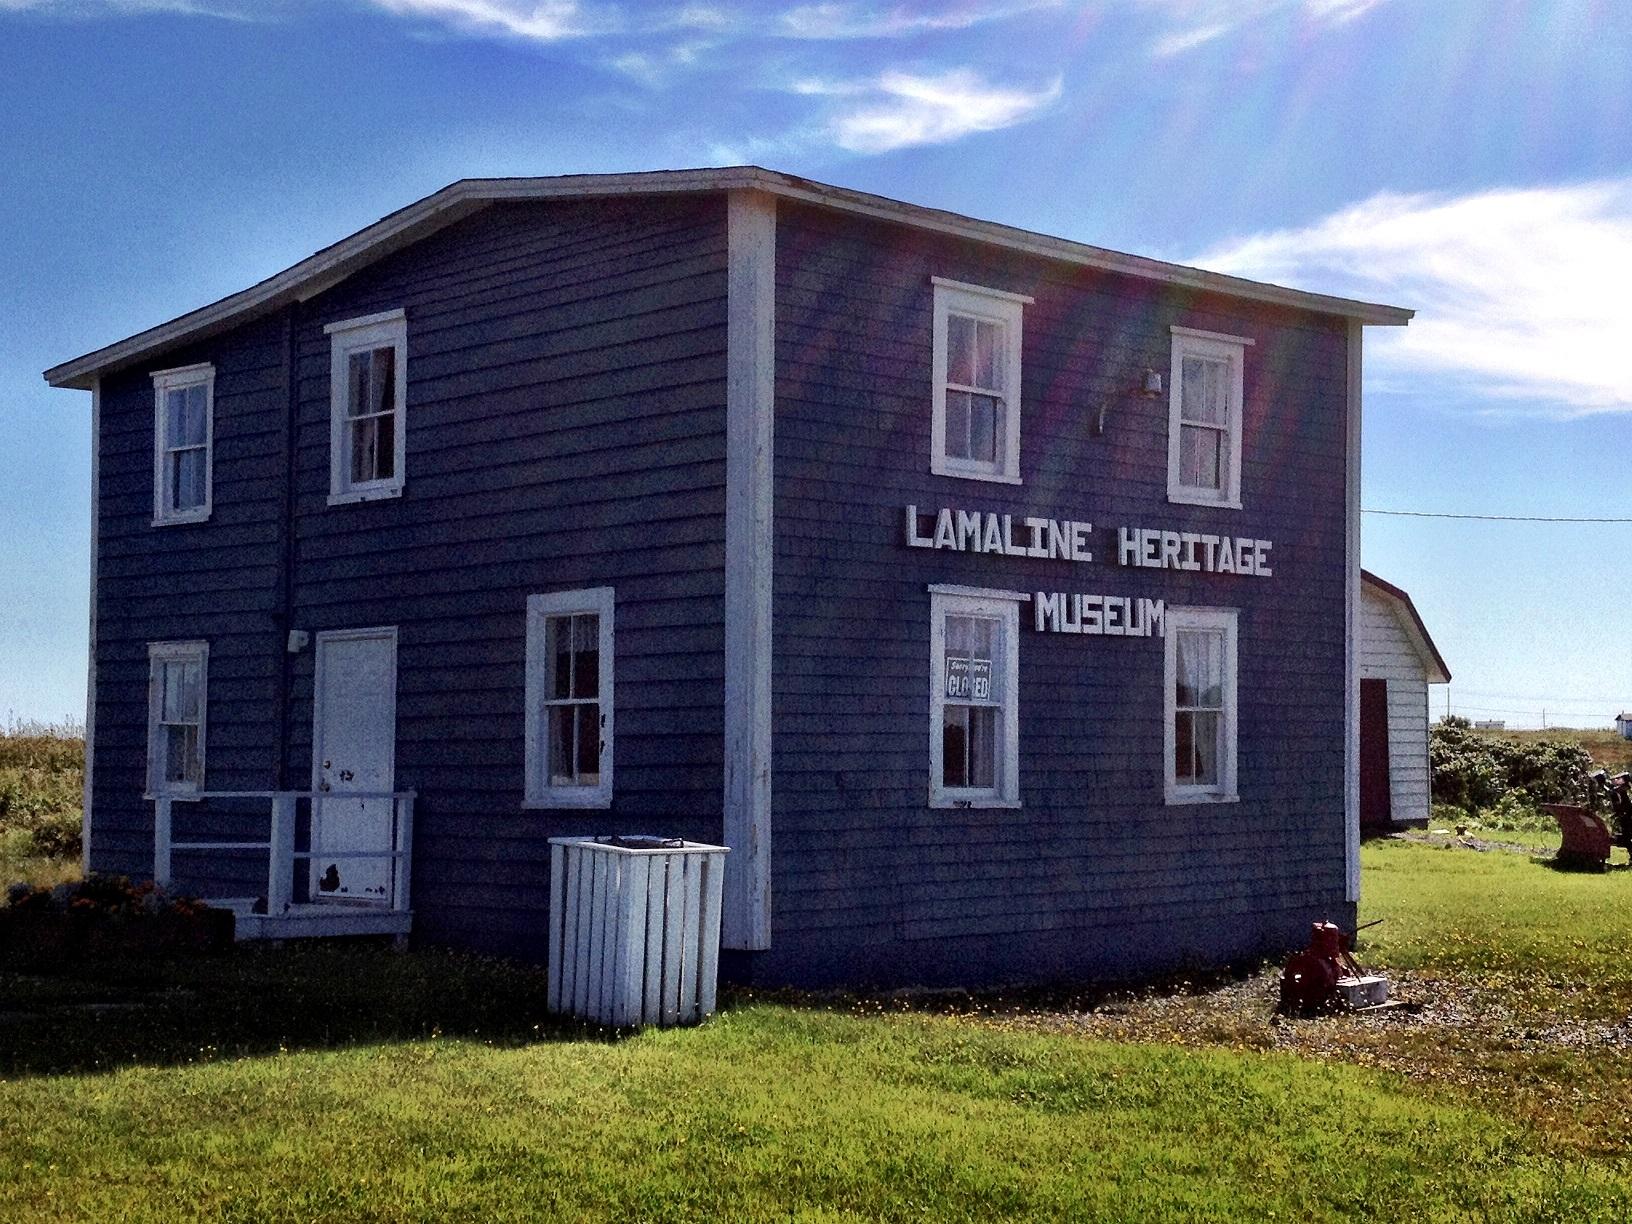 Lamaline Heritage Museum